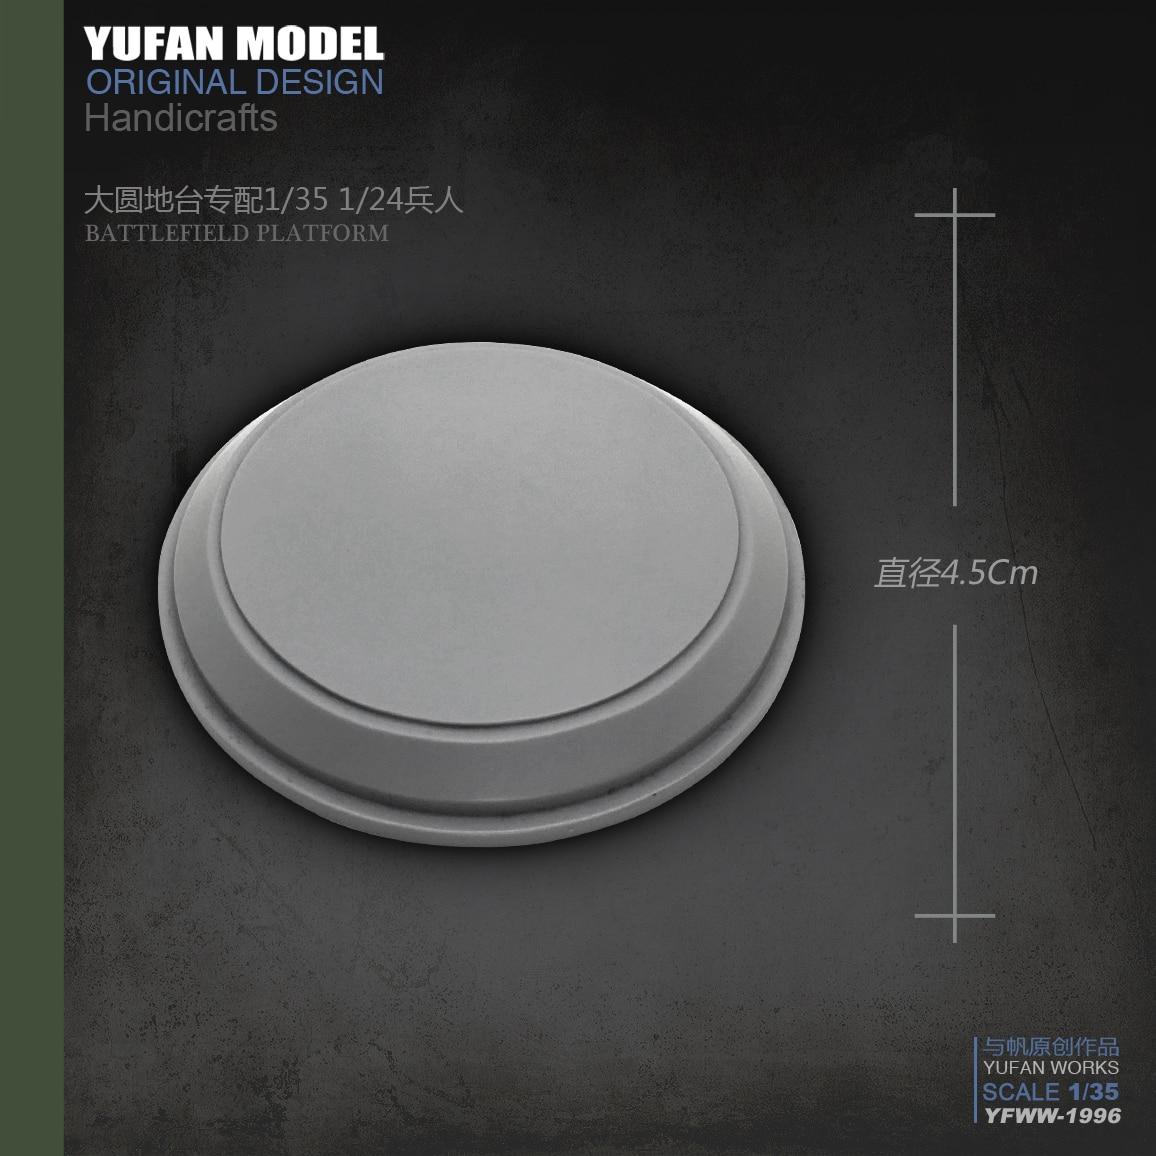 Yufan Model  Resin Platform Of 4.5cm Resin Soldier Accessories  YFWW-1997